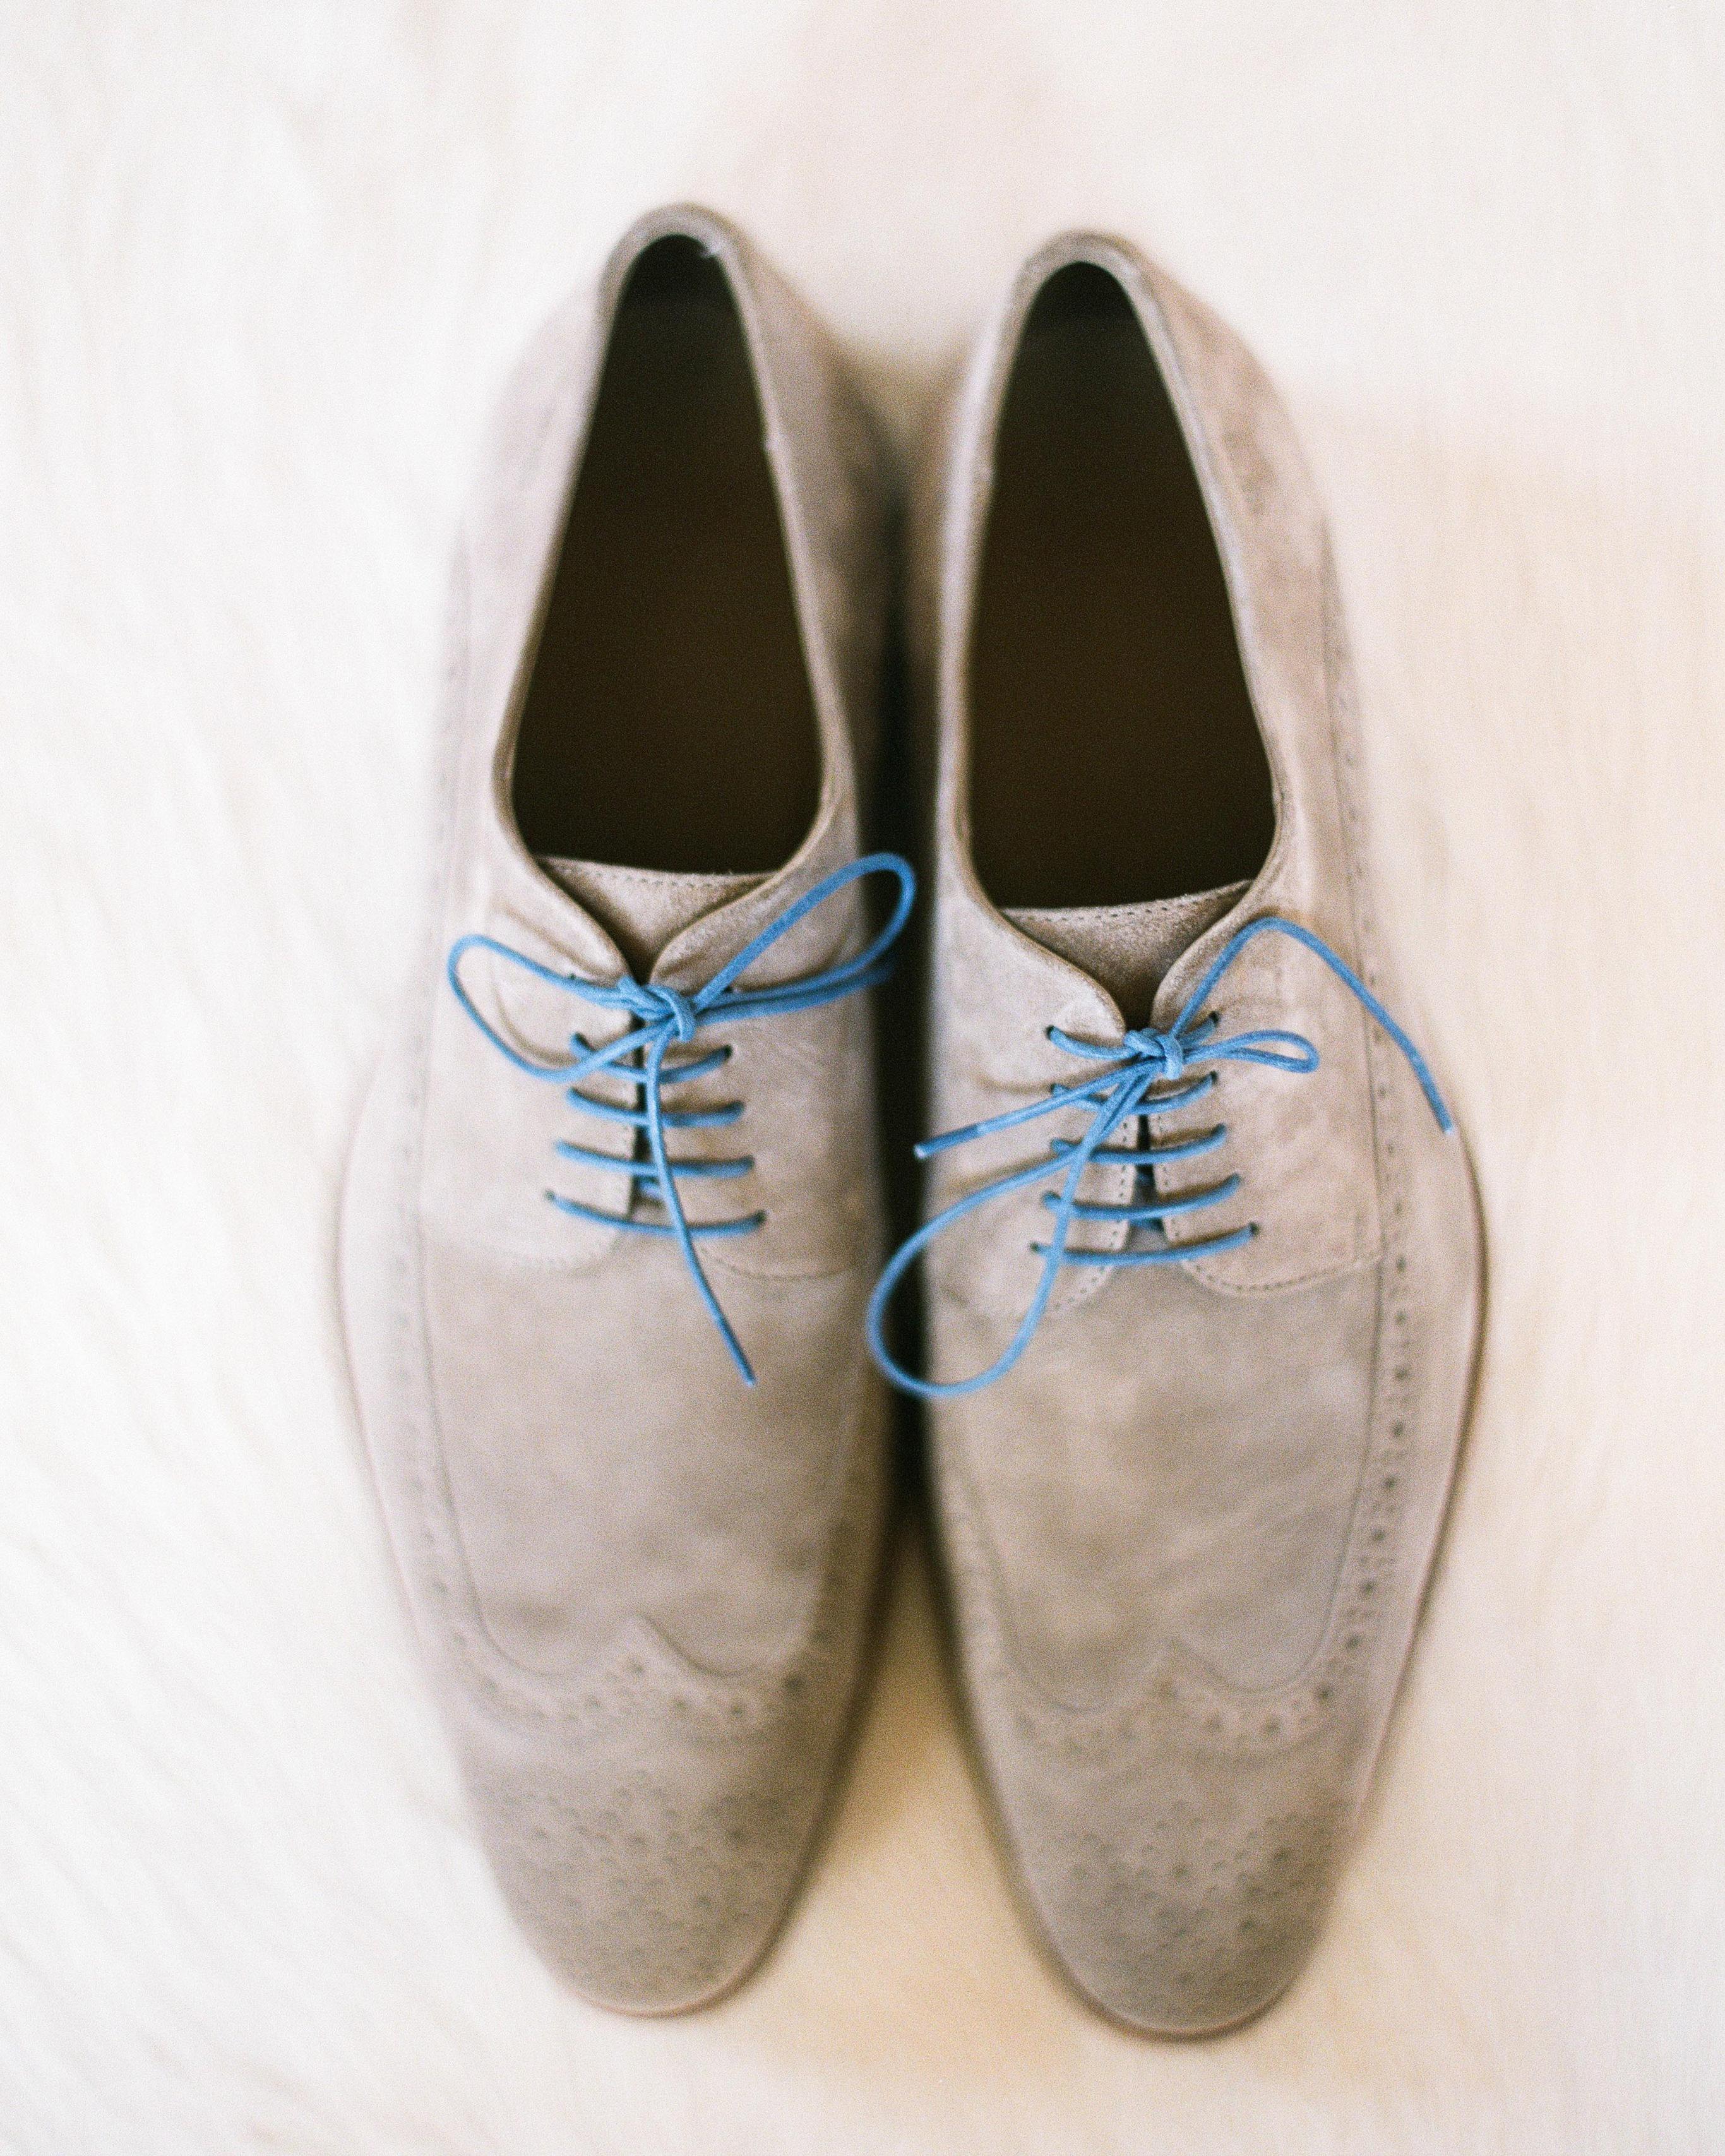 regina-jack-wedding-shoes-21-s111820-0215.jpg